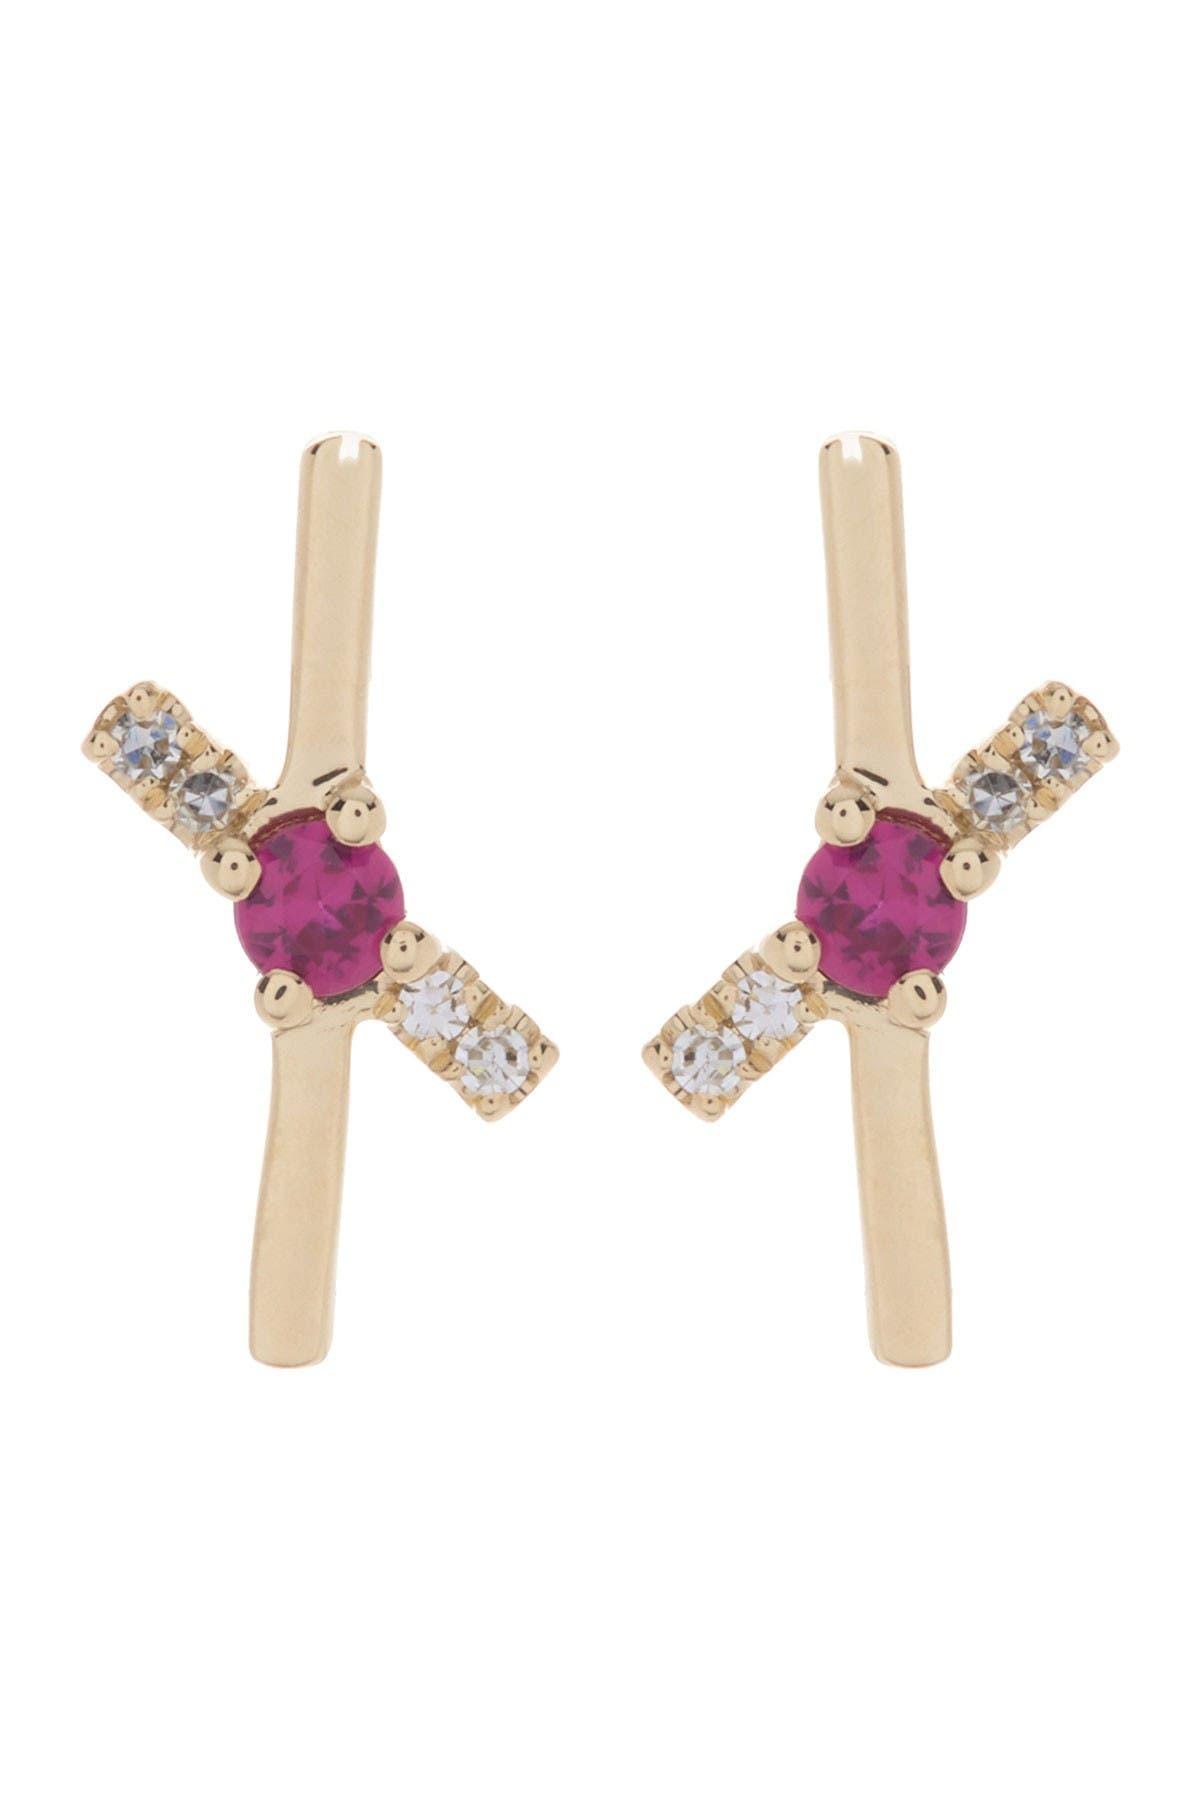 Ron Hami 14K Yellow Gold Ruby & Diamond Stud Earrings - 0.03 ctw at Nordstrom Rack